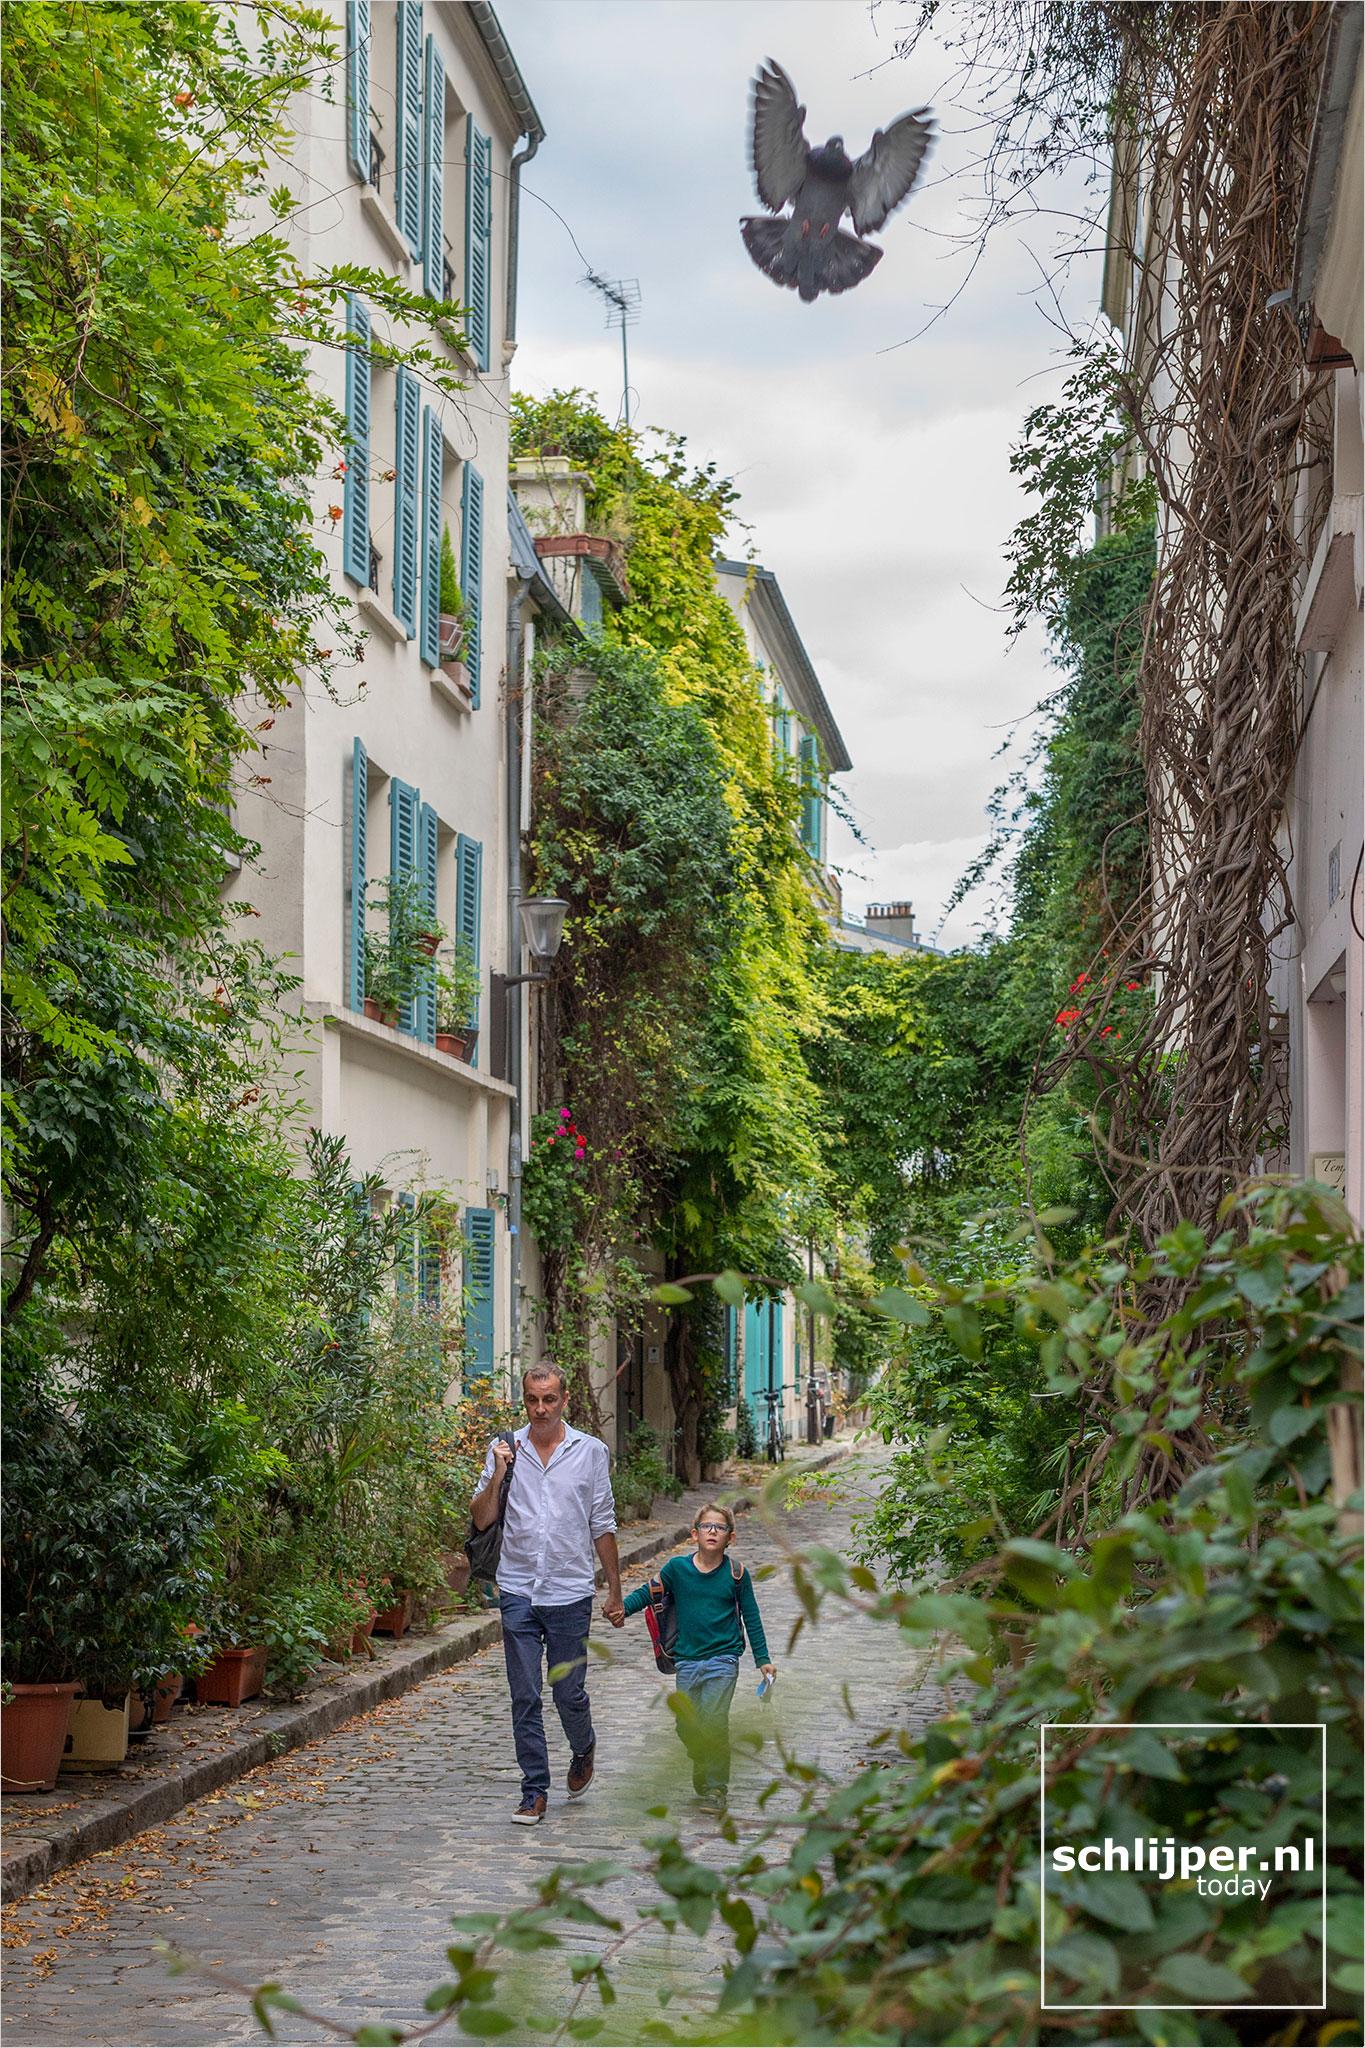 France, Paris, 16 september 2021